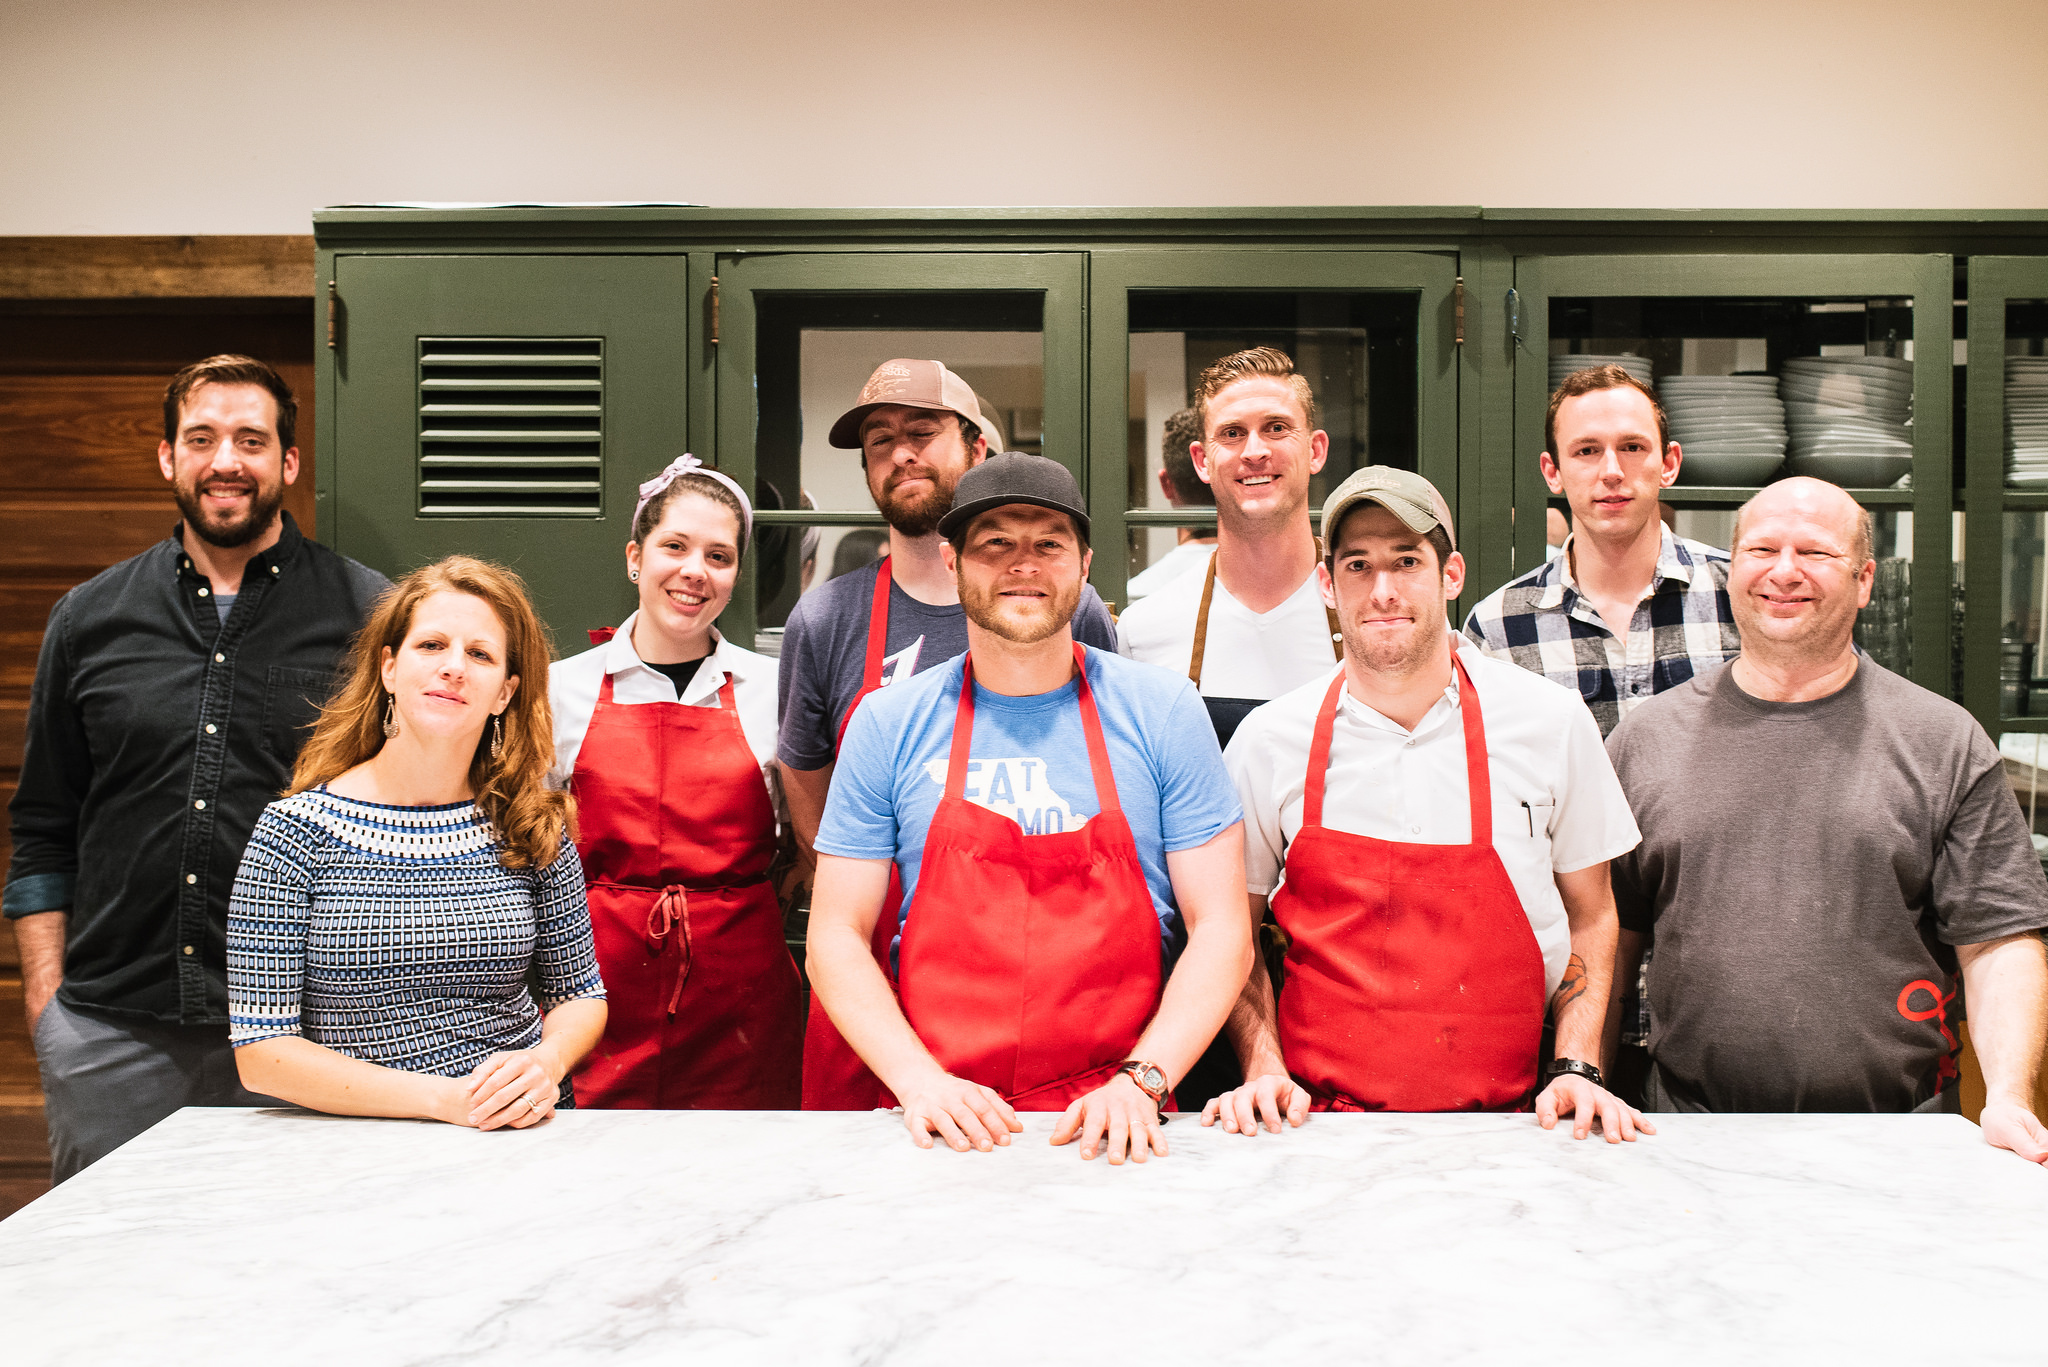 chris bolyard's chefs